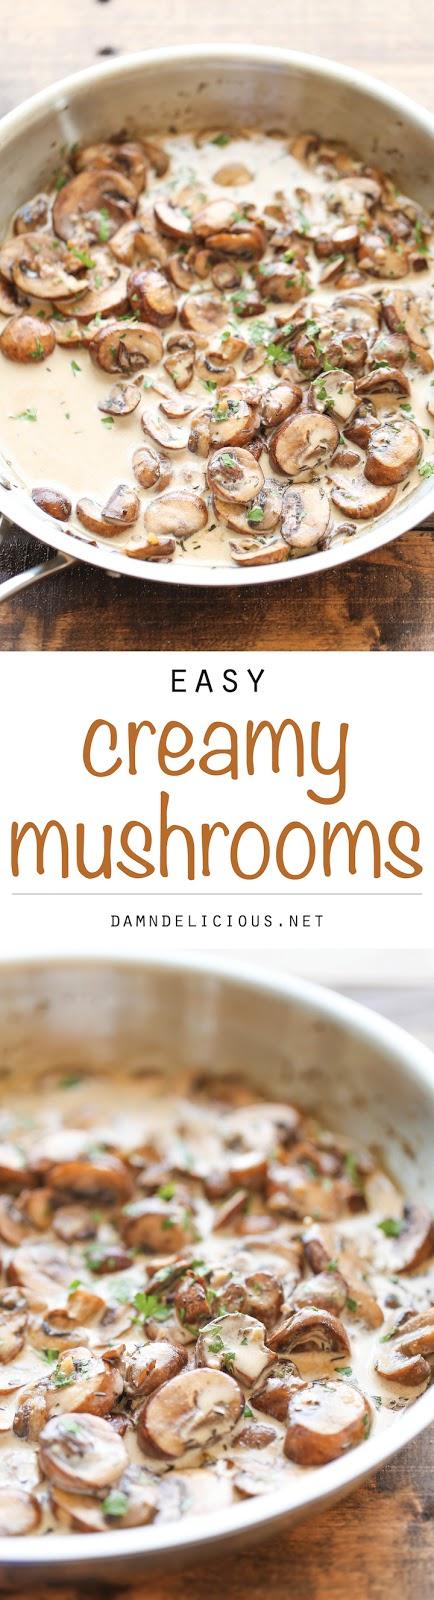 THE BEST CREAMY MUSHROOMS RECIPE